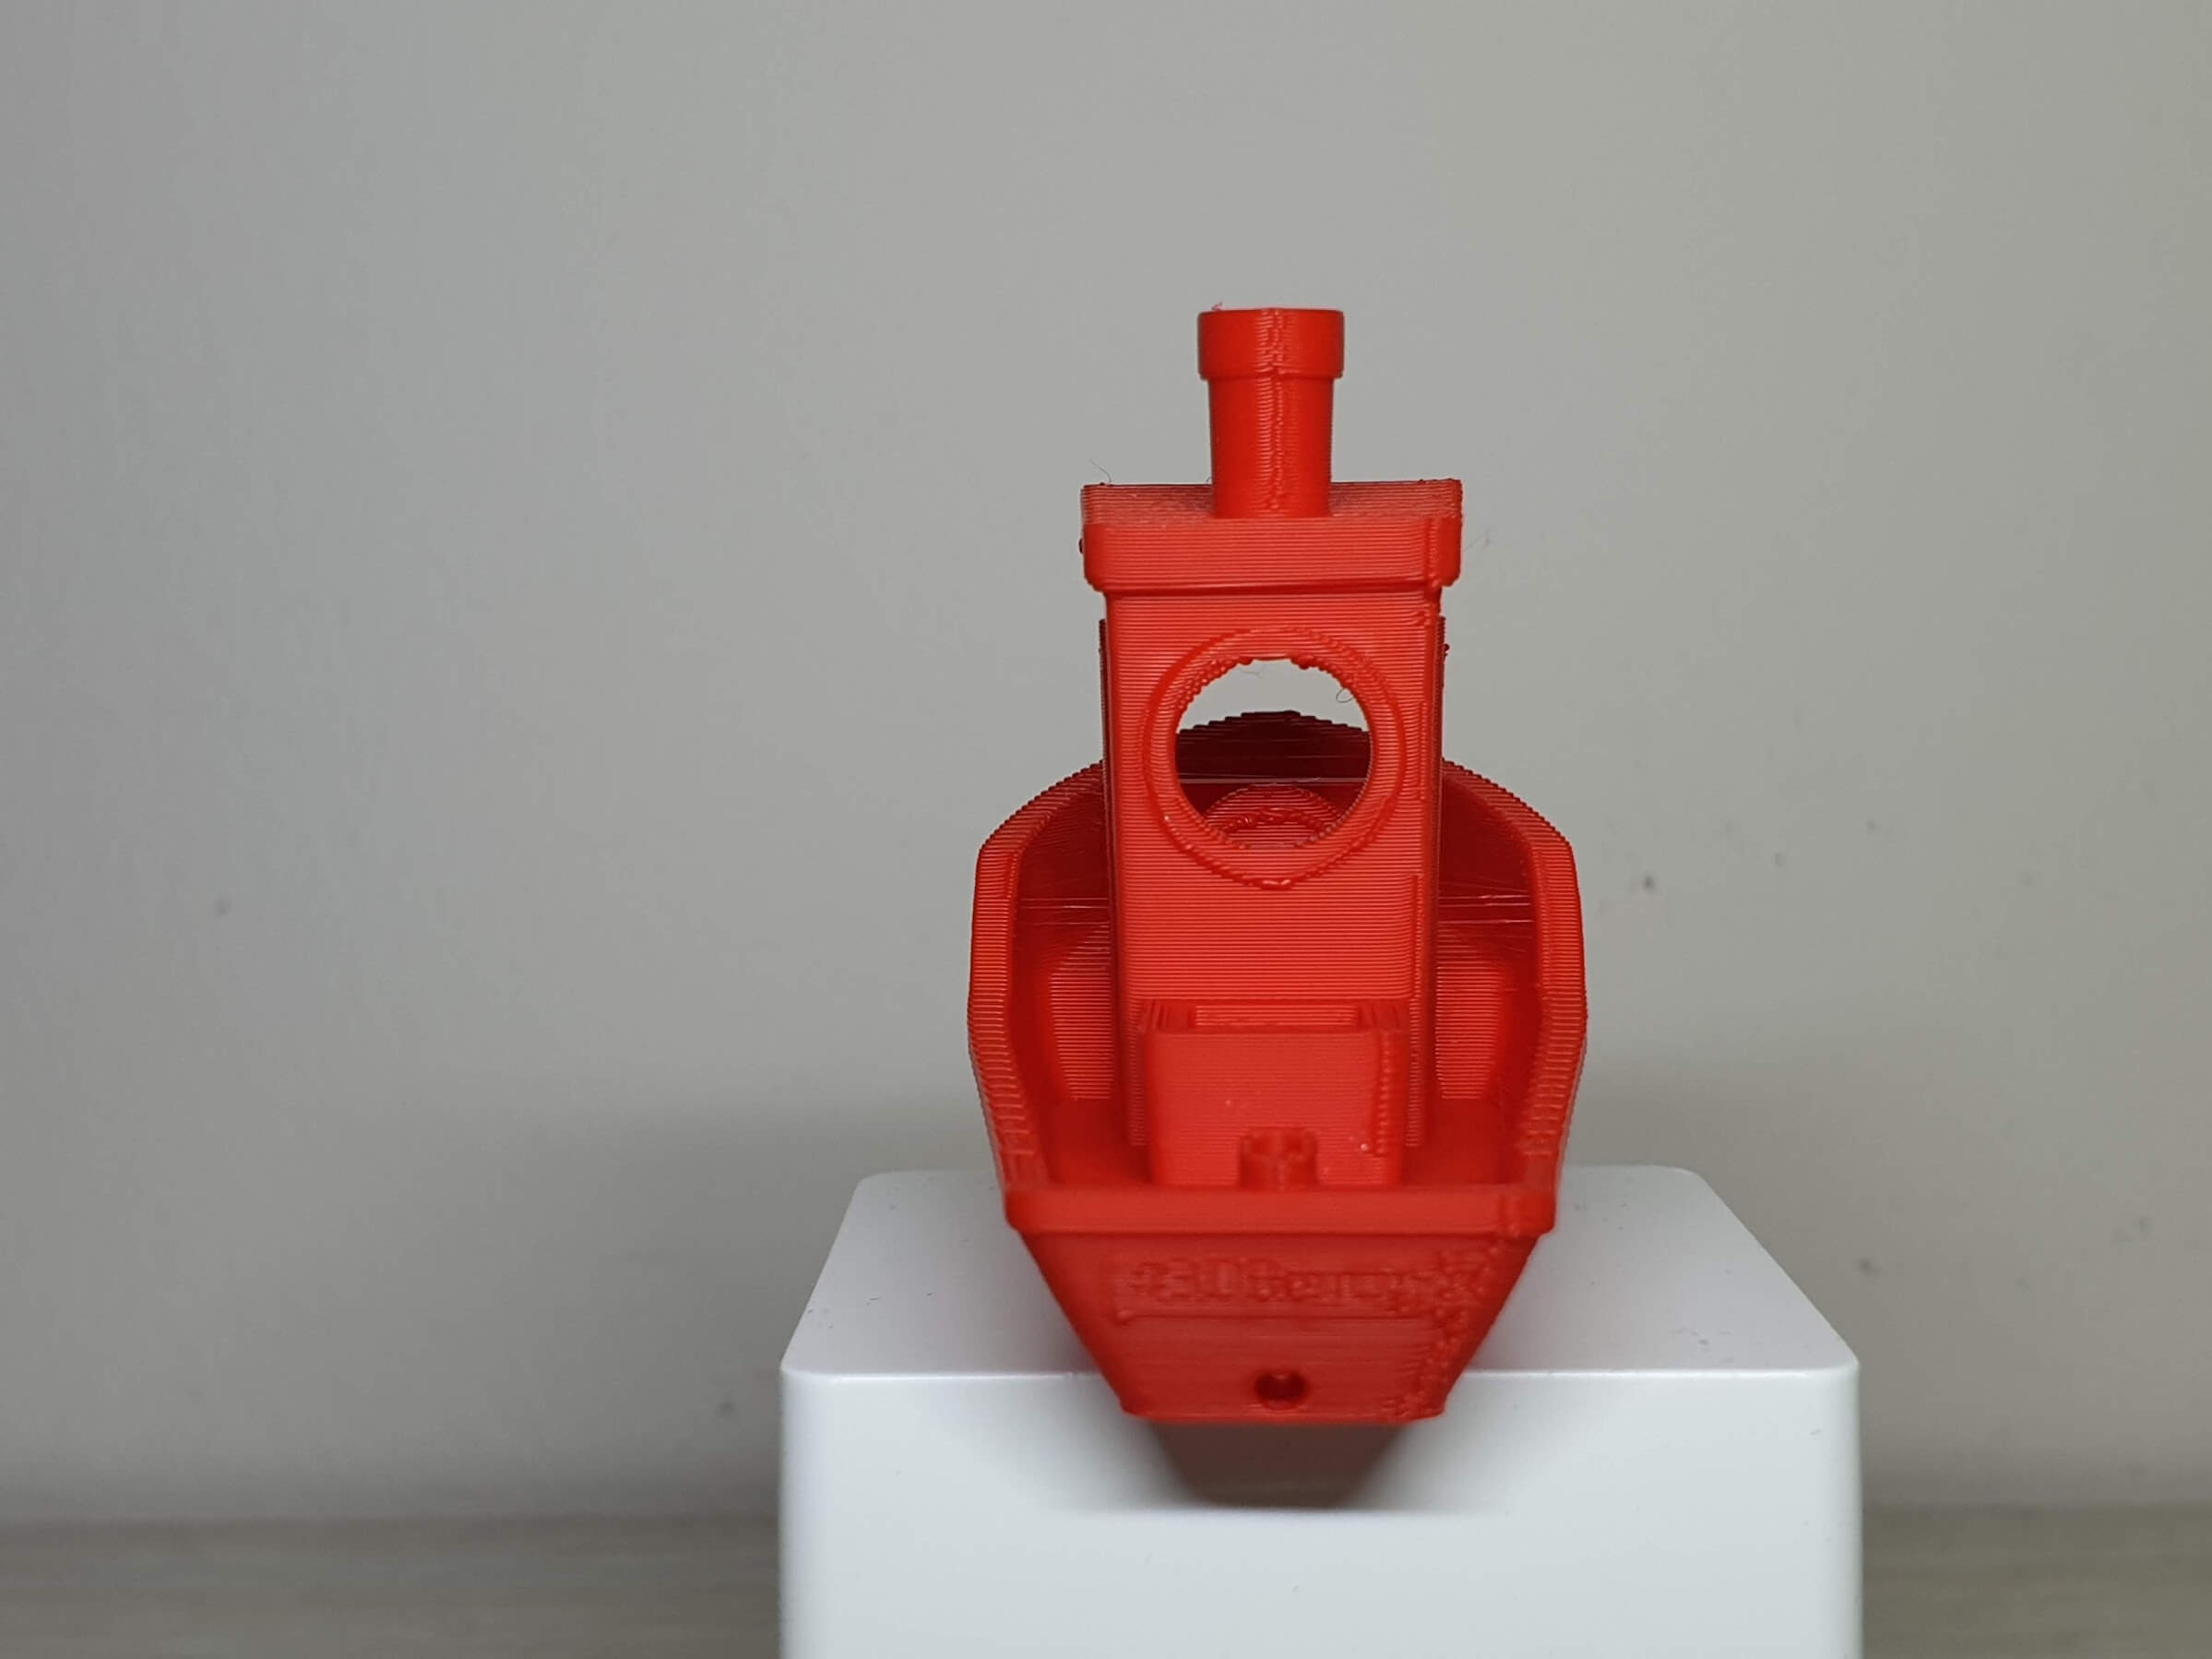 BIQU-B1-3D-Benchy-print-test-2